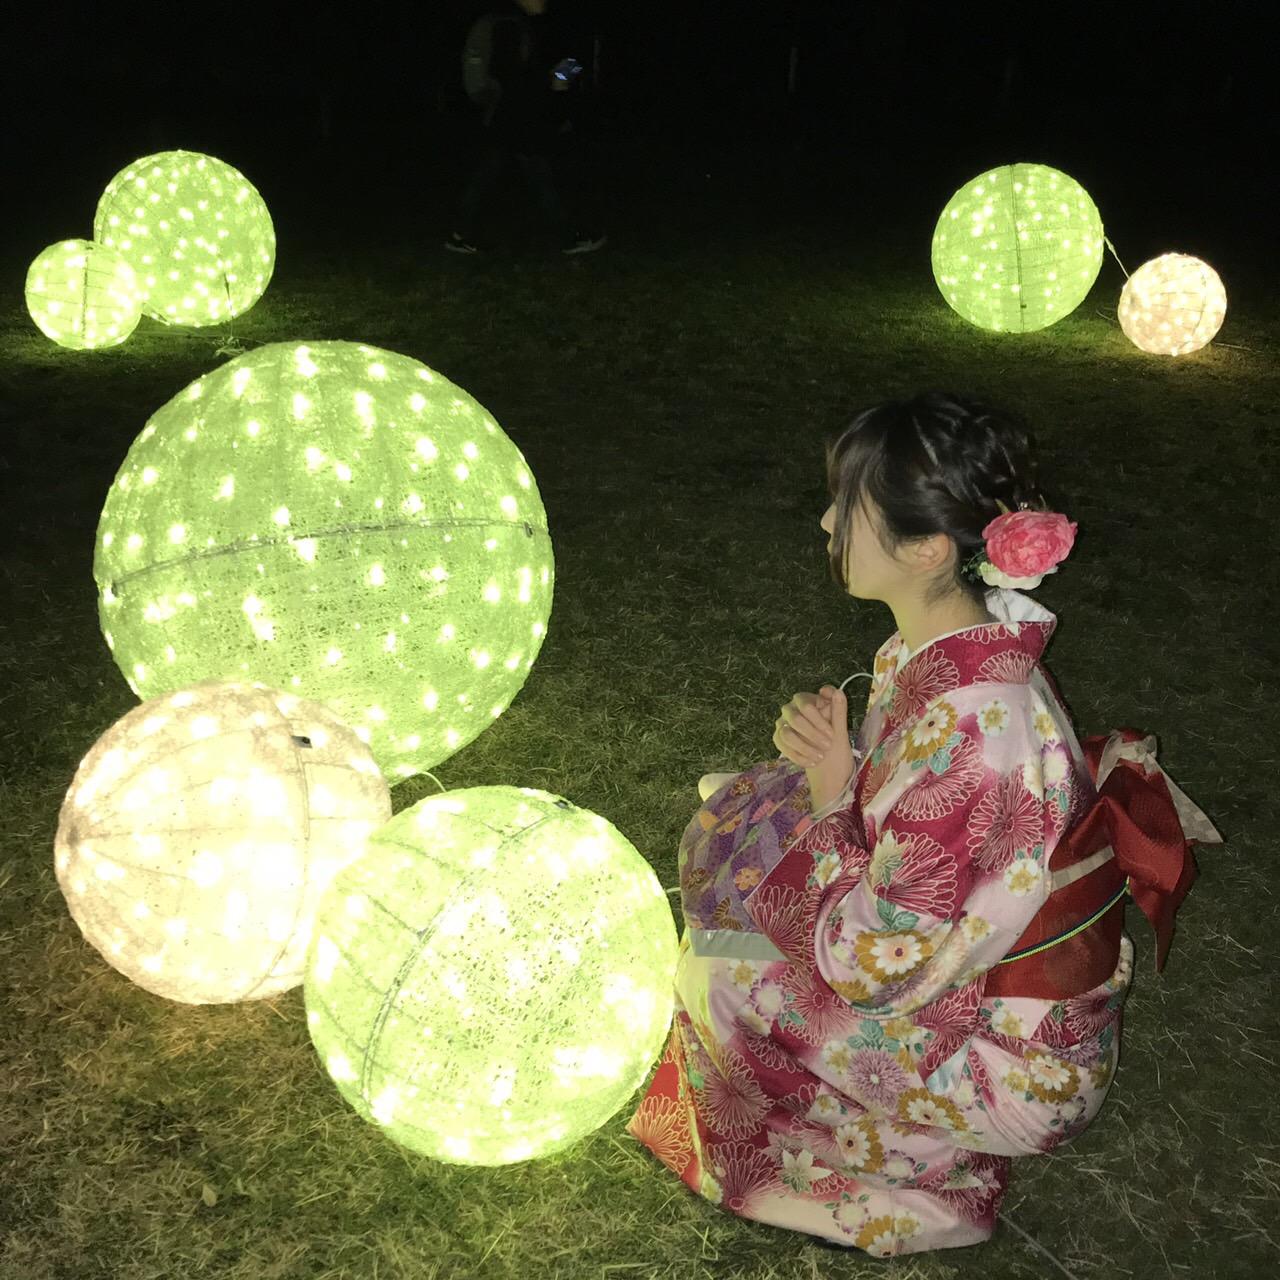 京都御苑の枝垂桜2019年3月25日9